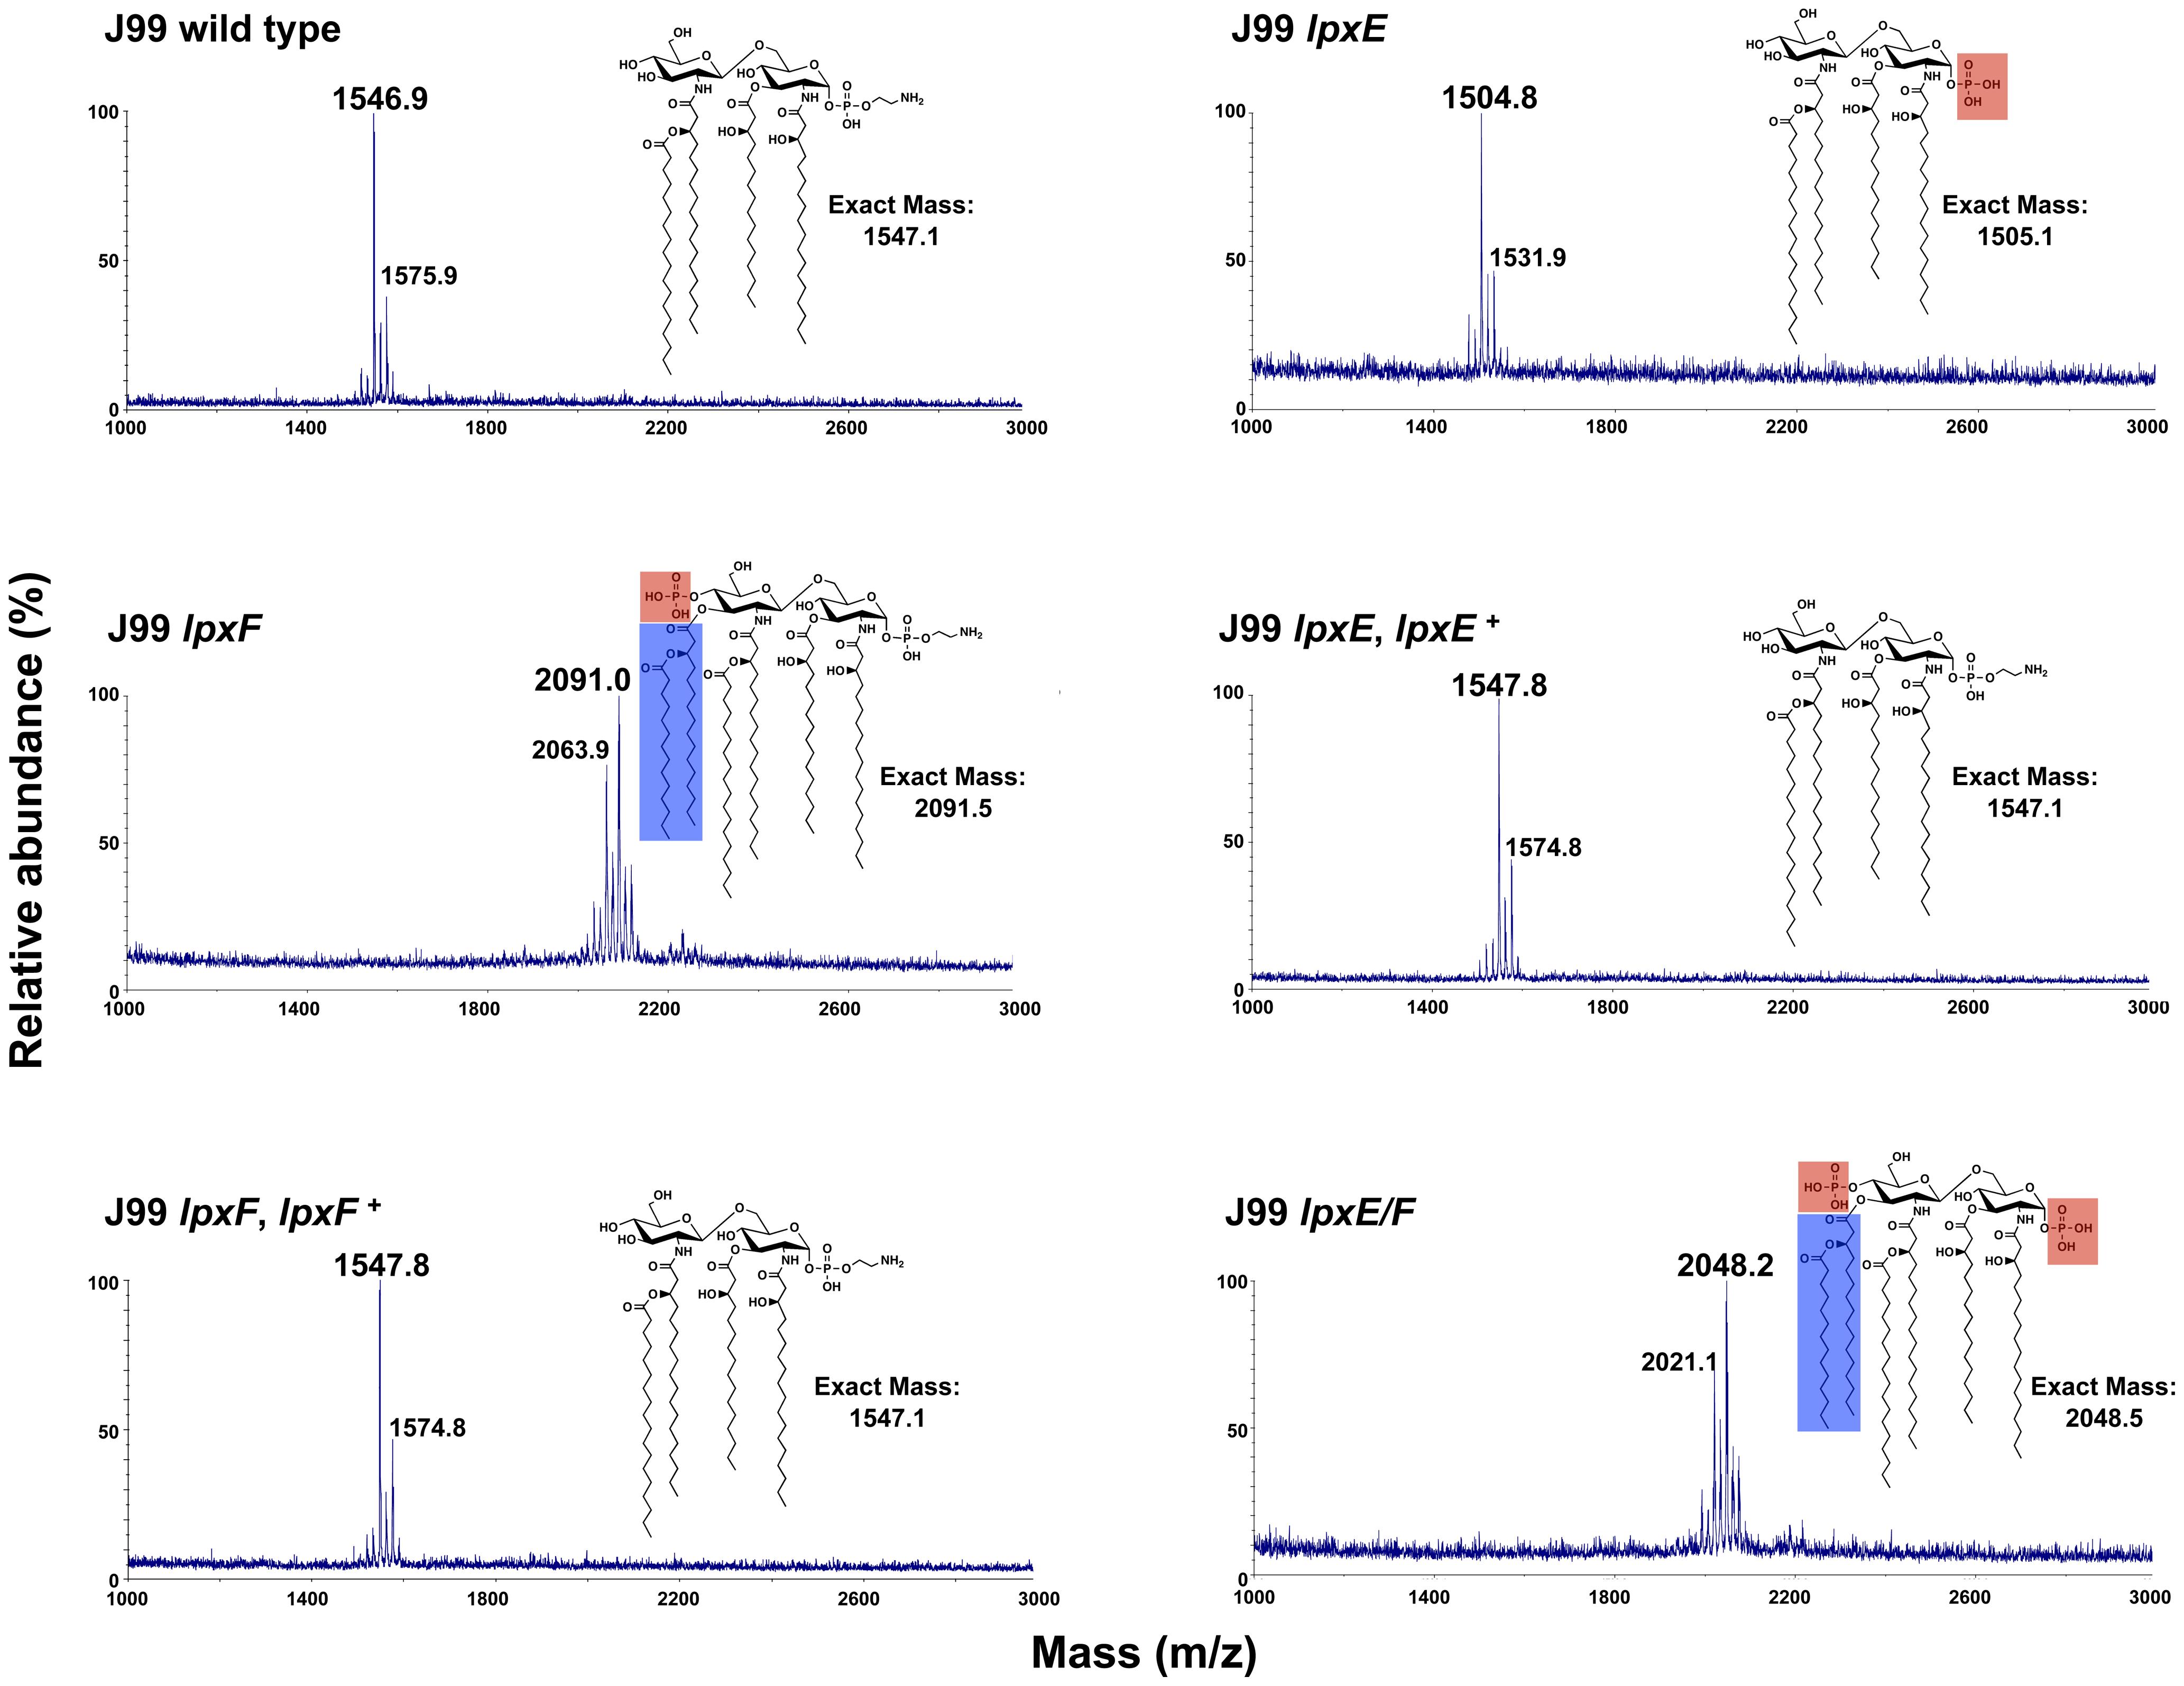 Mass spectrometry of <i>lpxE</i>, <i>lpxF</i> and <i>lpxE/F</i> mutants in strain J99.